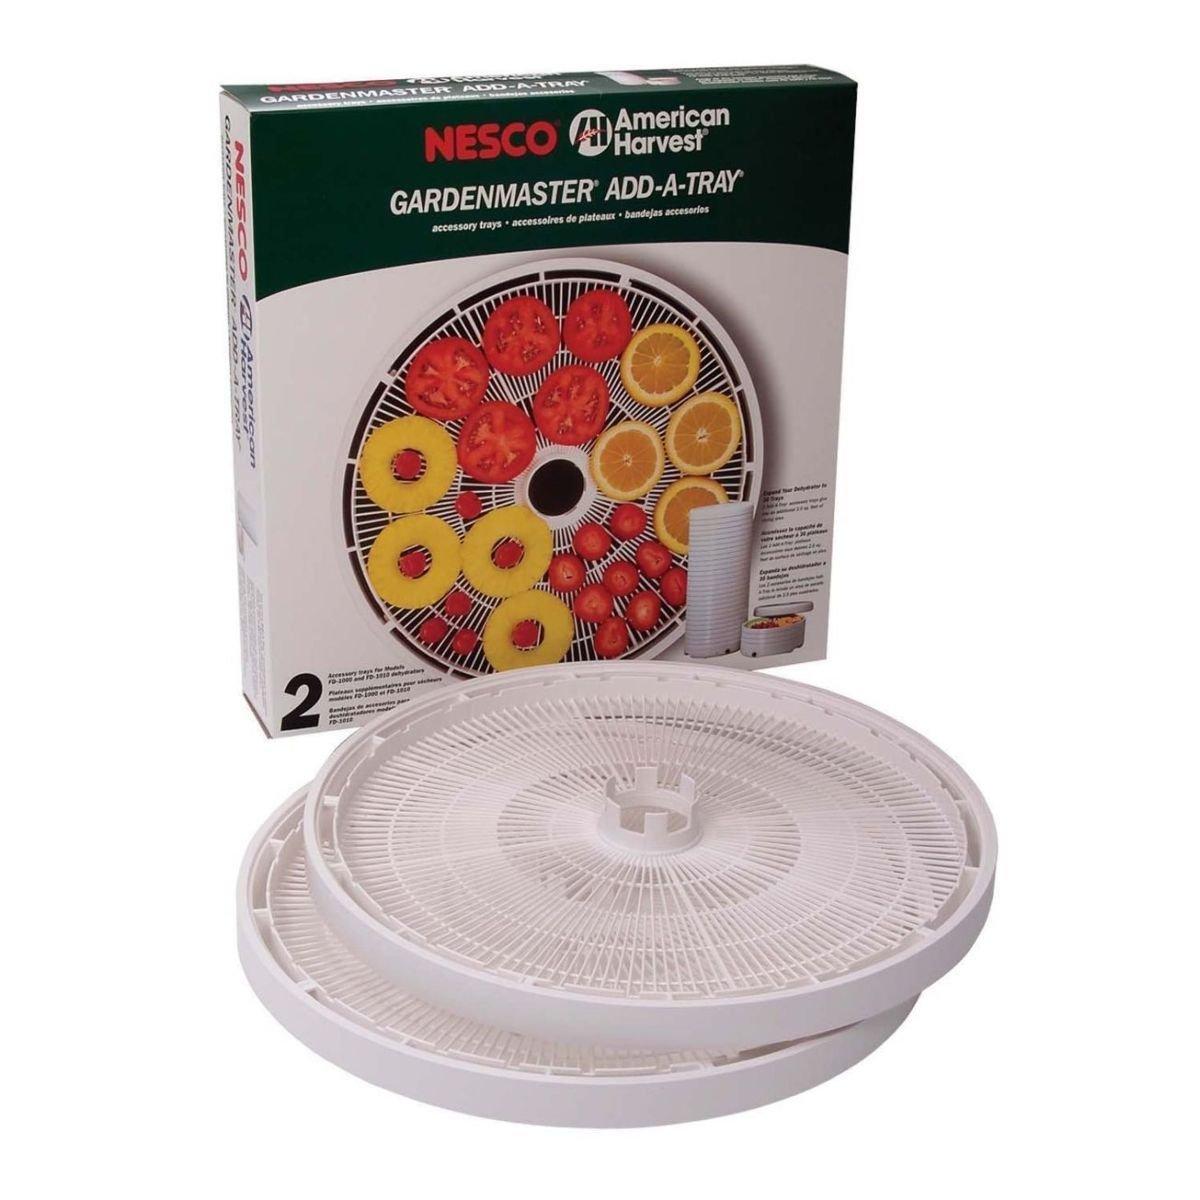 Nesco Tr-2 Gardenmaster Dehydrator Add-a-tray Accessory Trays 2 Pack